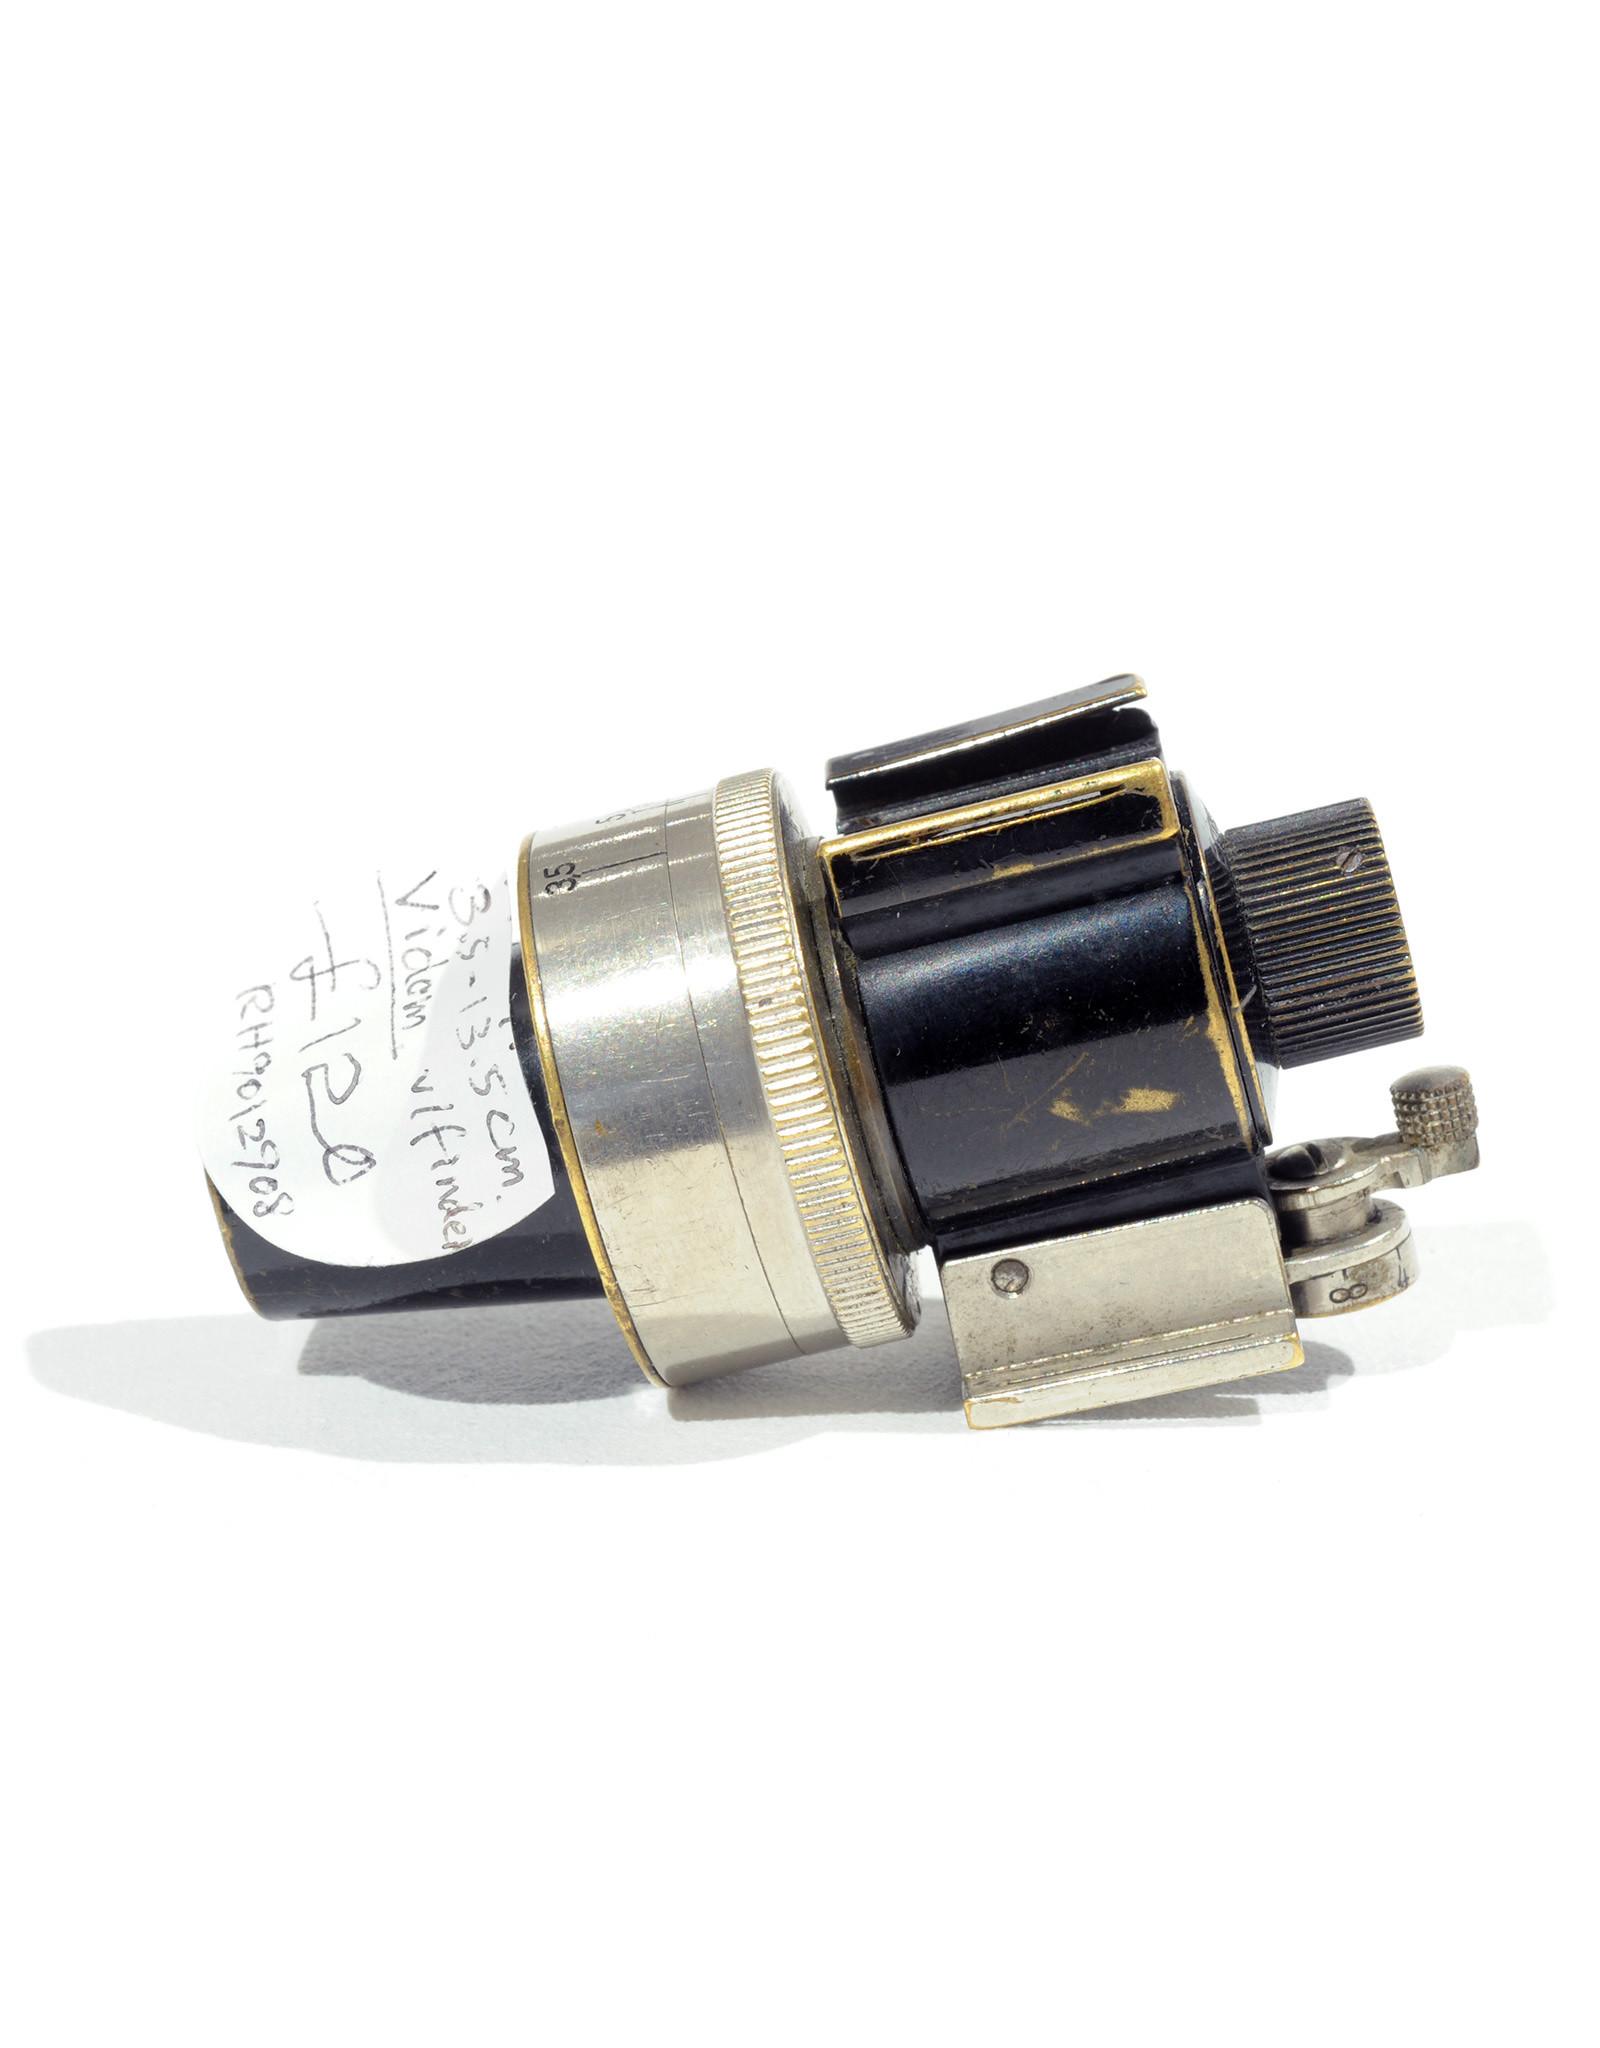 Leica Leica Vario Focal V/finder Vidom Nickel  RH9012908